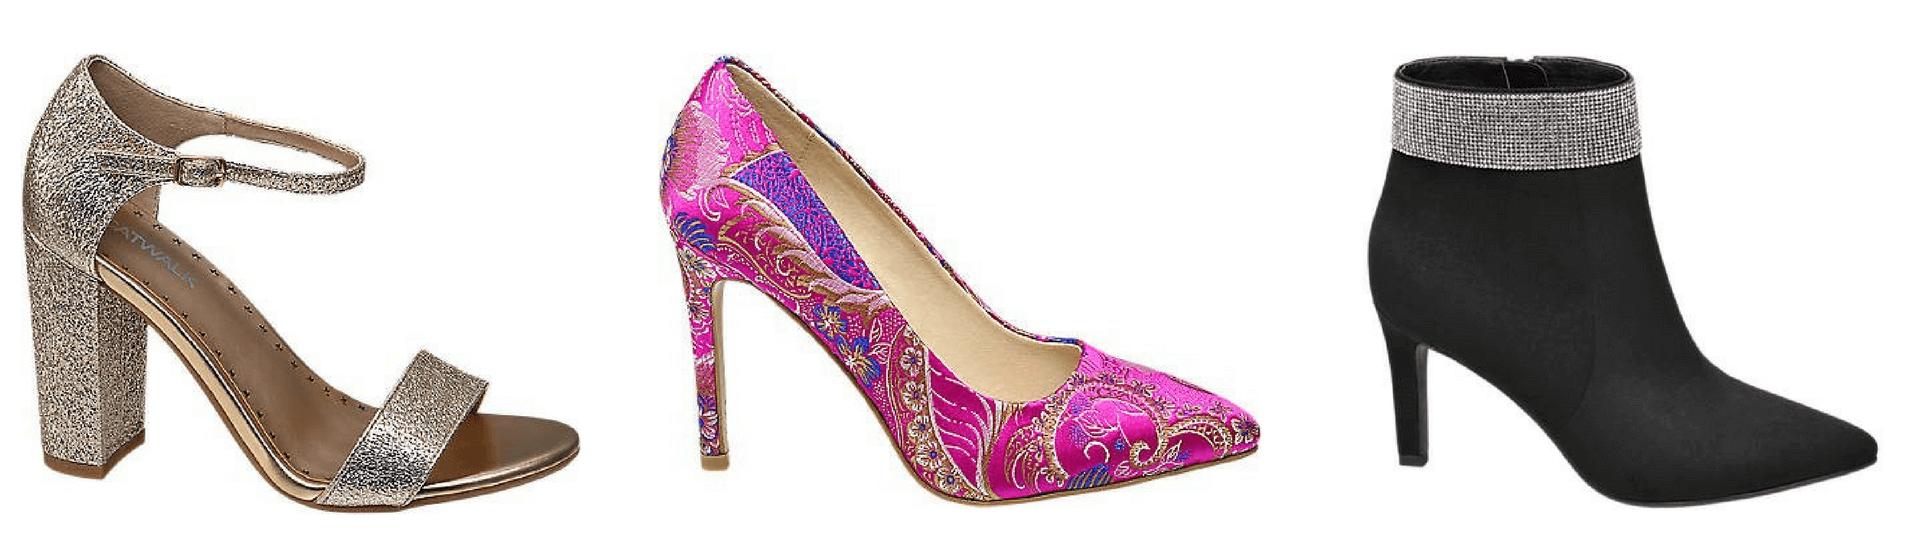 510b100f0a5 Slip into Glamorous Shoes for Party Season | Deichmann